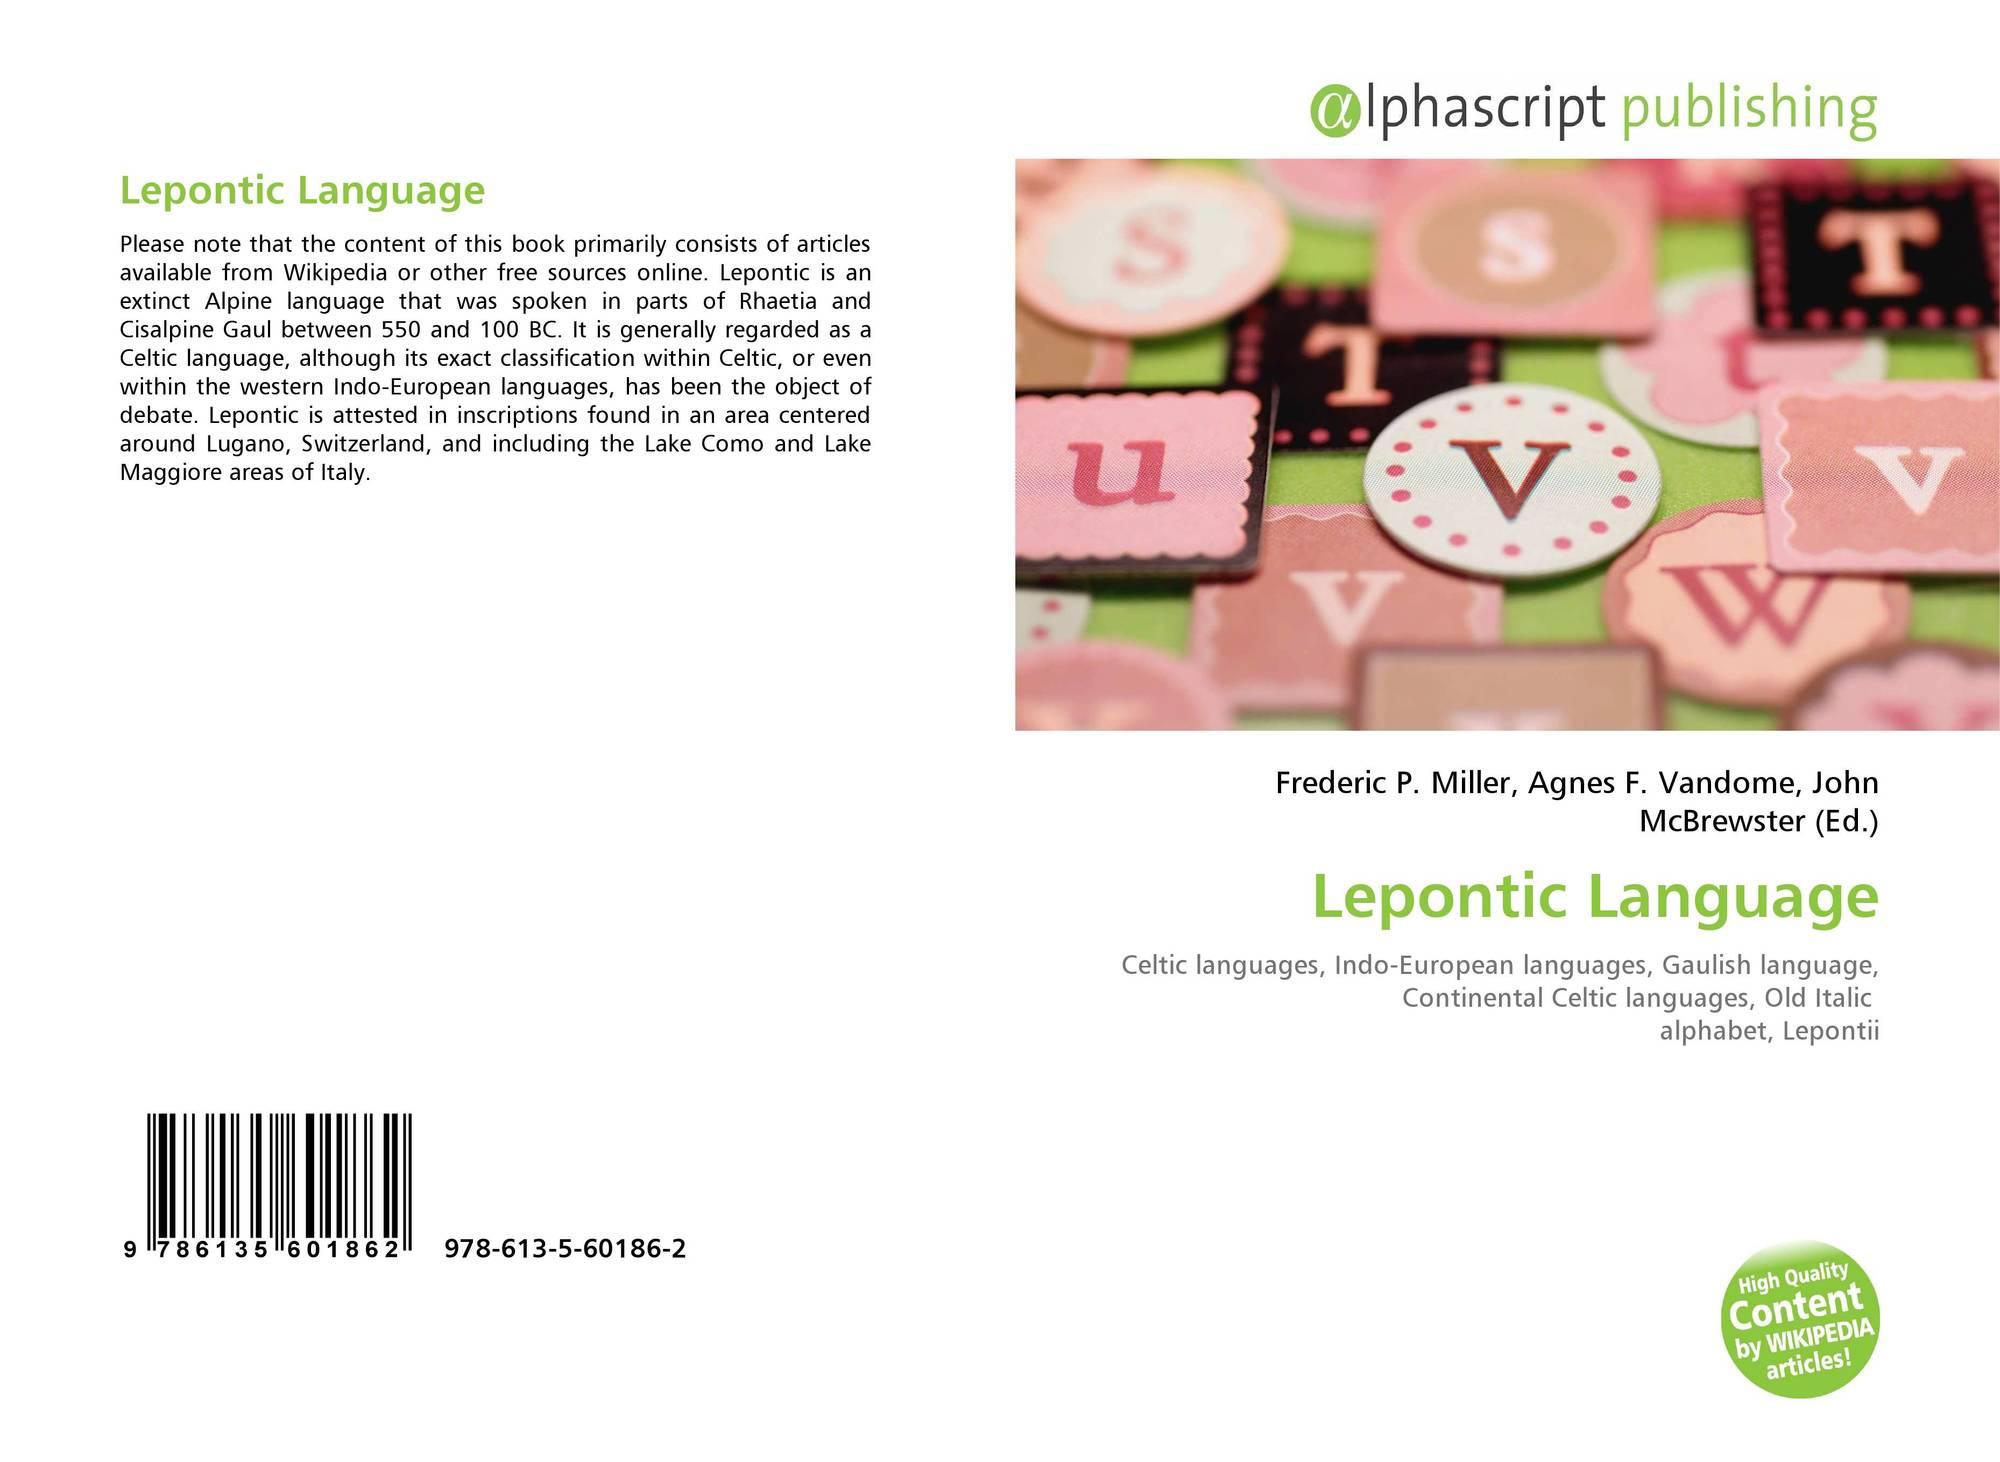 Lepontic Language 978 613 5 60186 2 6135601865 9786135601862